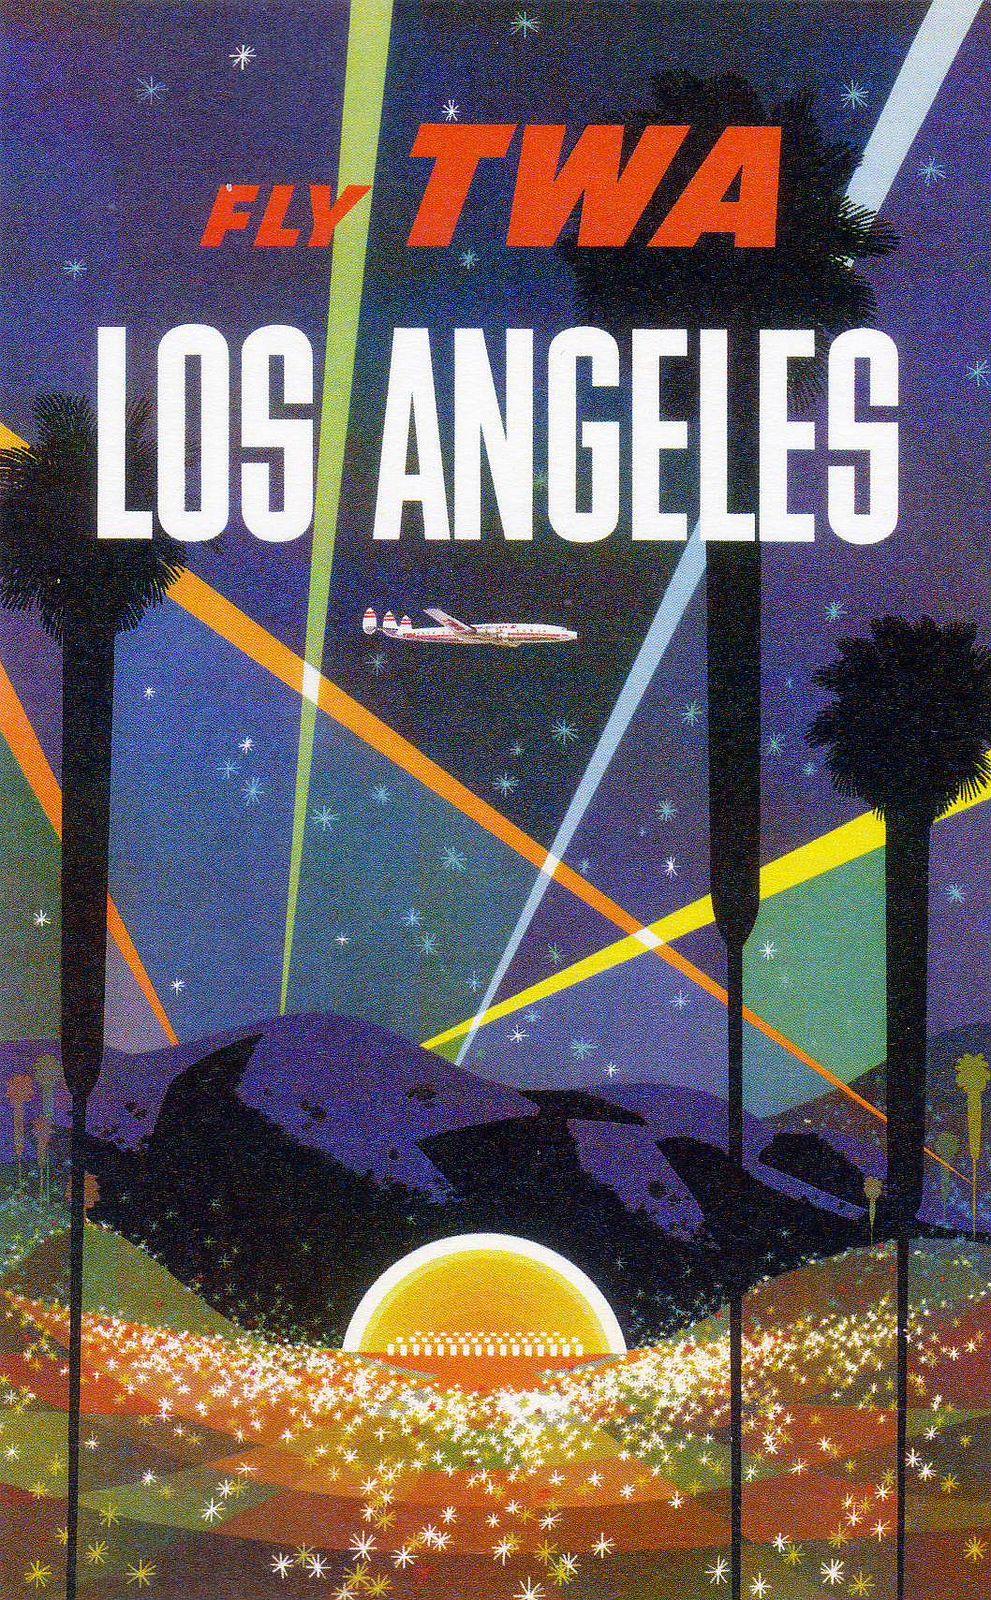 Fly TWA Los Angeles Hollywood Bowl Vintage Poster By David Klein - Los angeles posters vintage